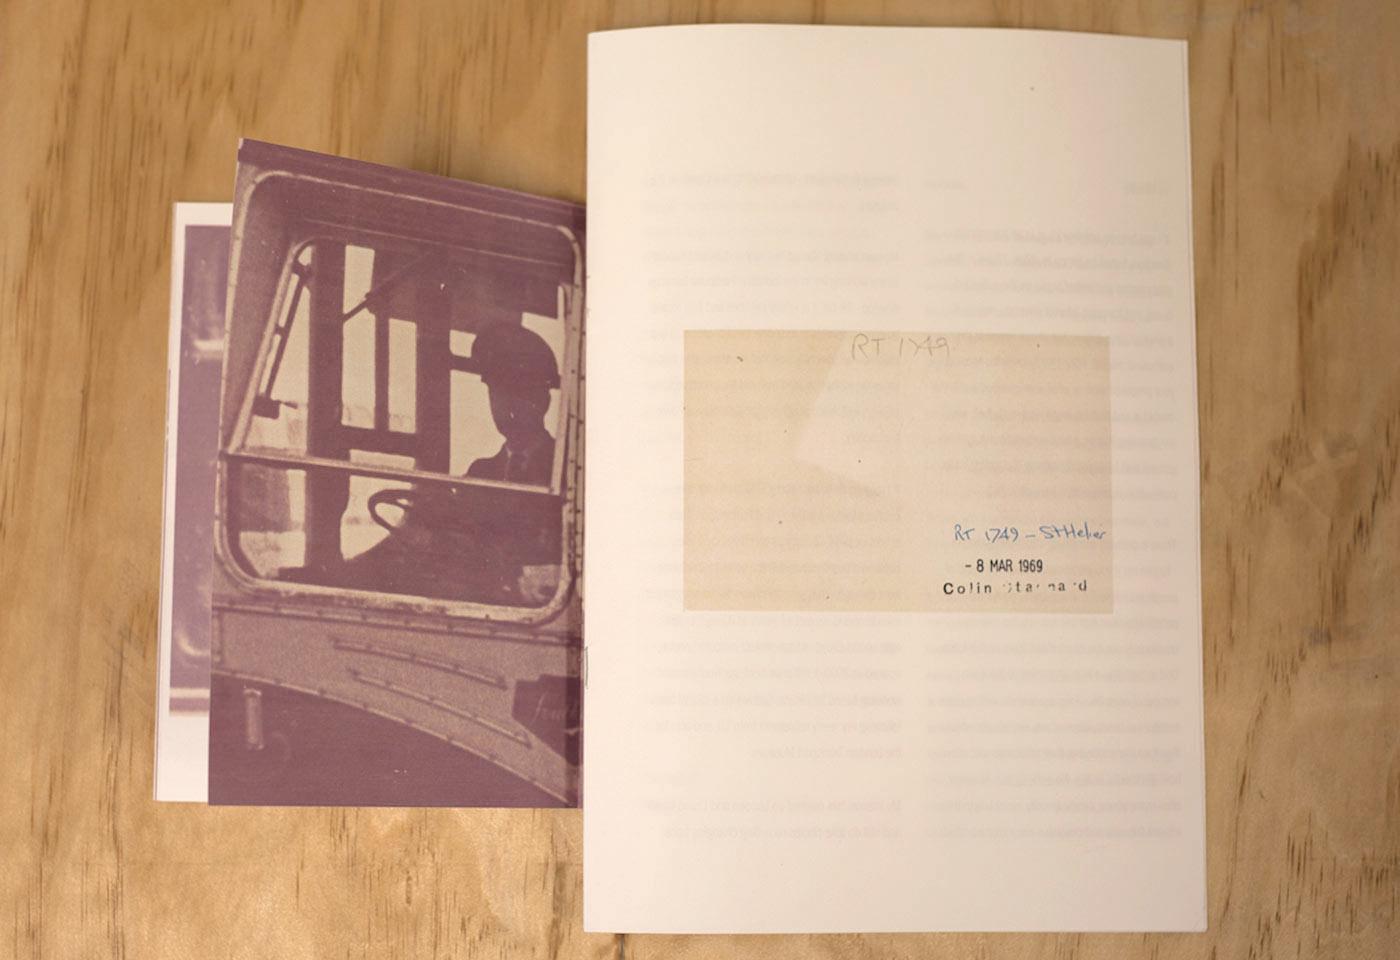 paula-roush-bus-spotting-photobook-msdm-publications-orphan1-143